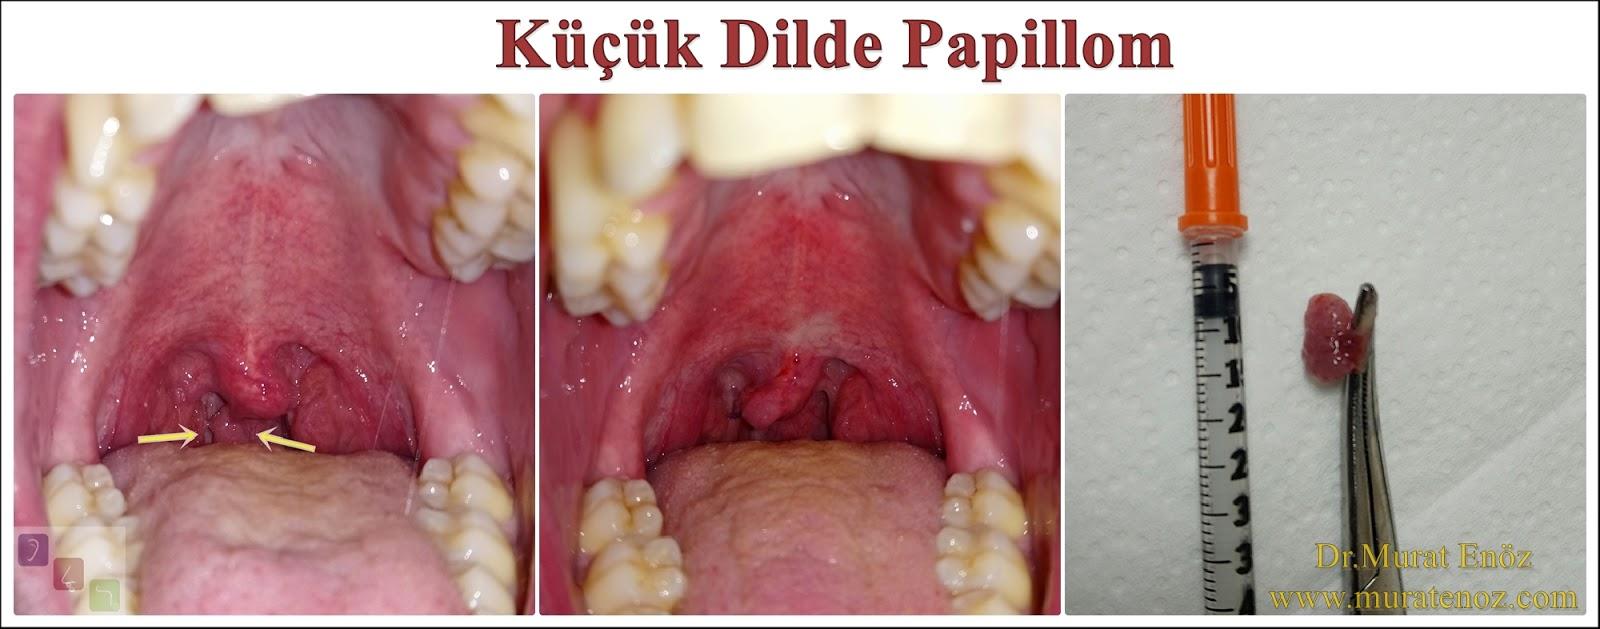 Hpv szemolcs labon, Human papillomavirus in greek Hpv szemolcs talpon